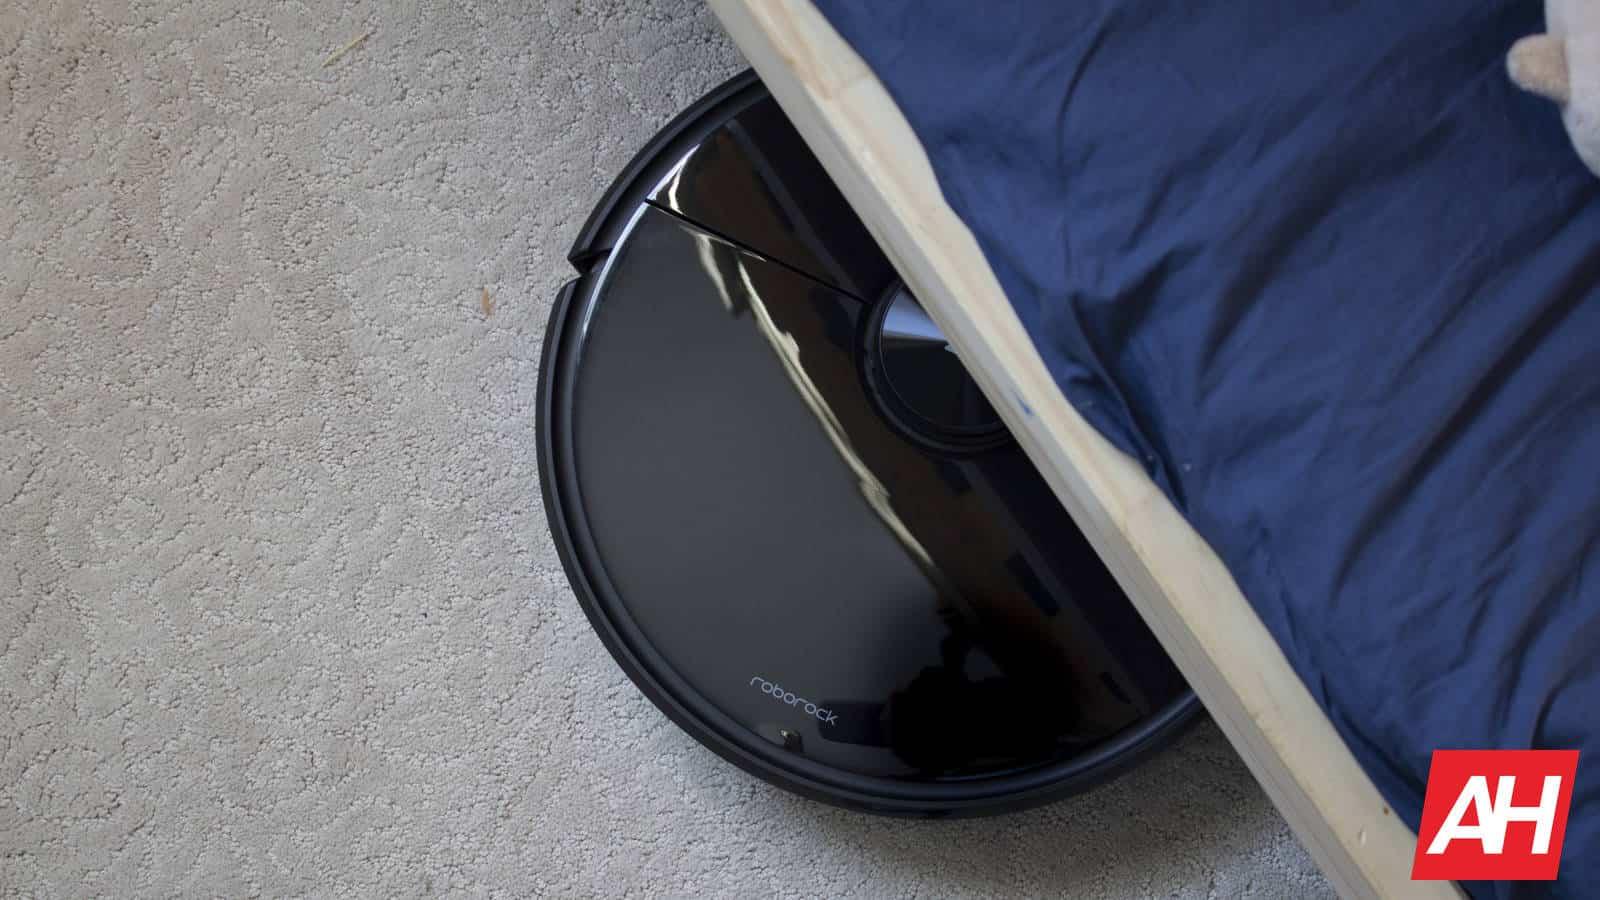 Roborock S6 MaxV under bed